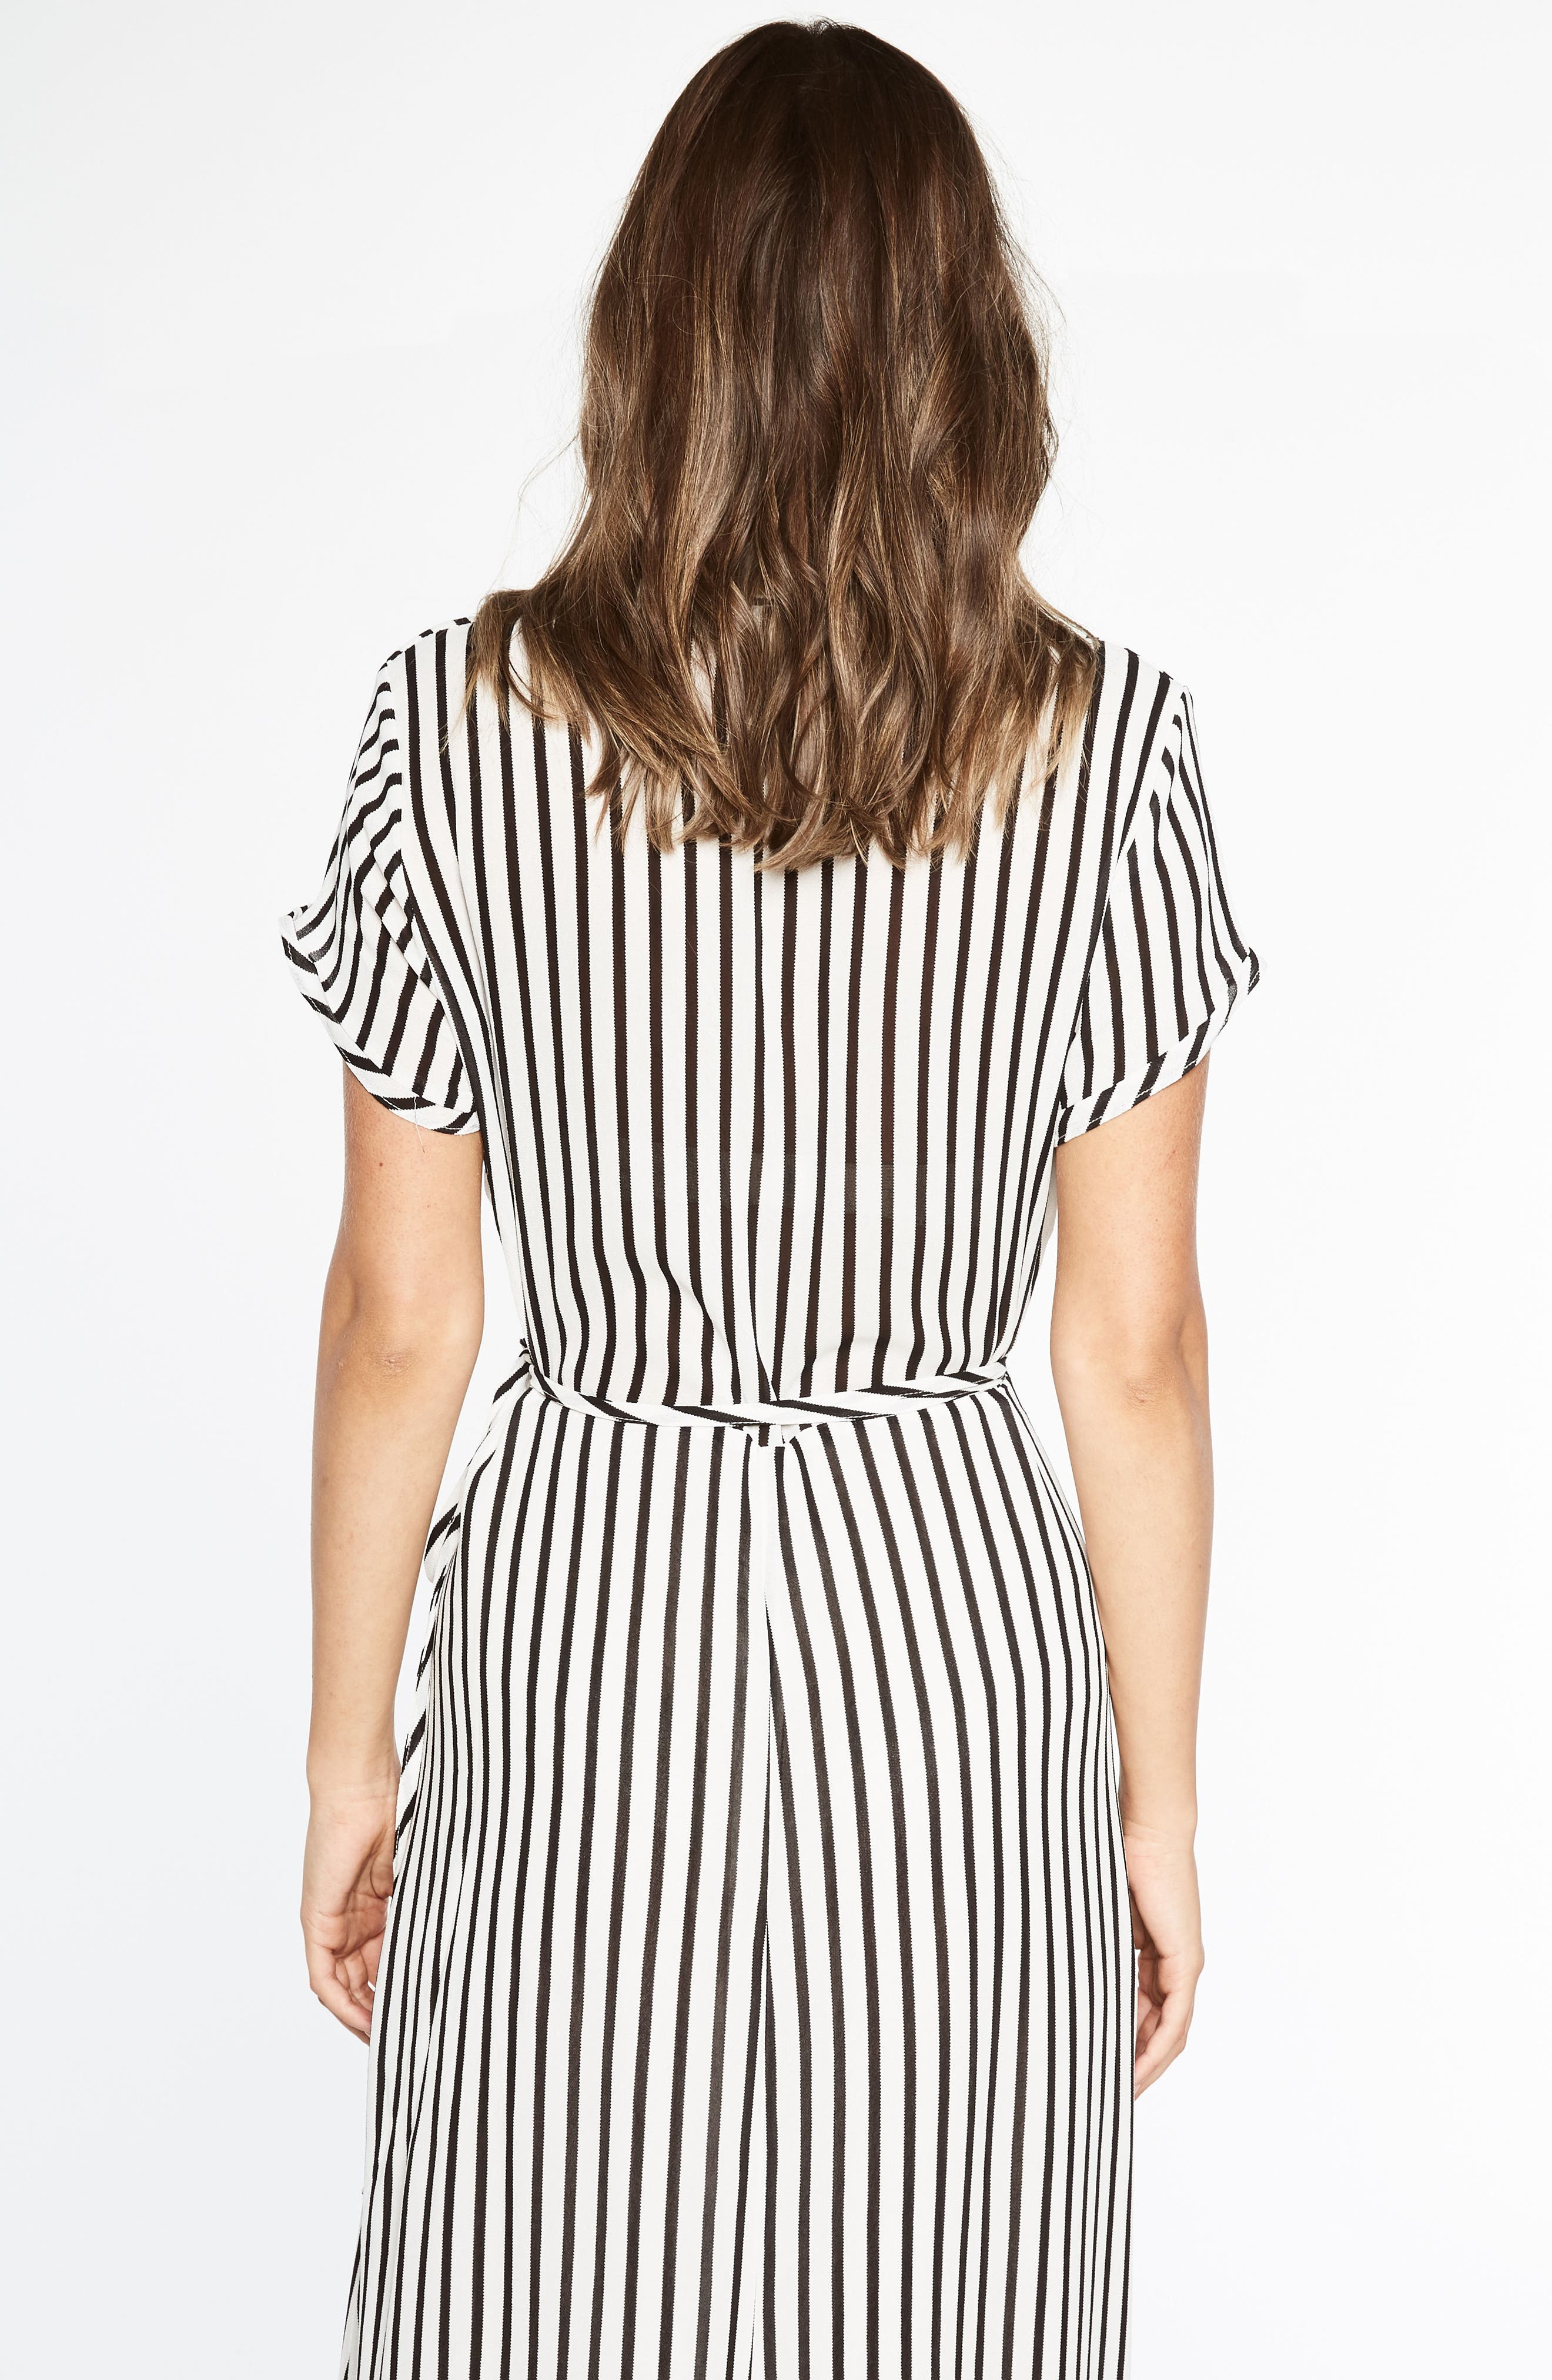 Adie Maxi Wrap Dress,                             Alternate thumbnail 8, color,                             013